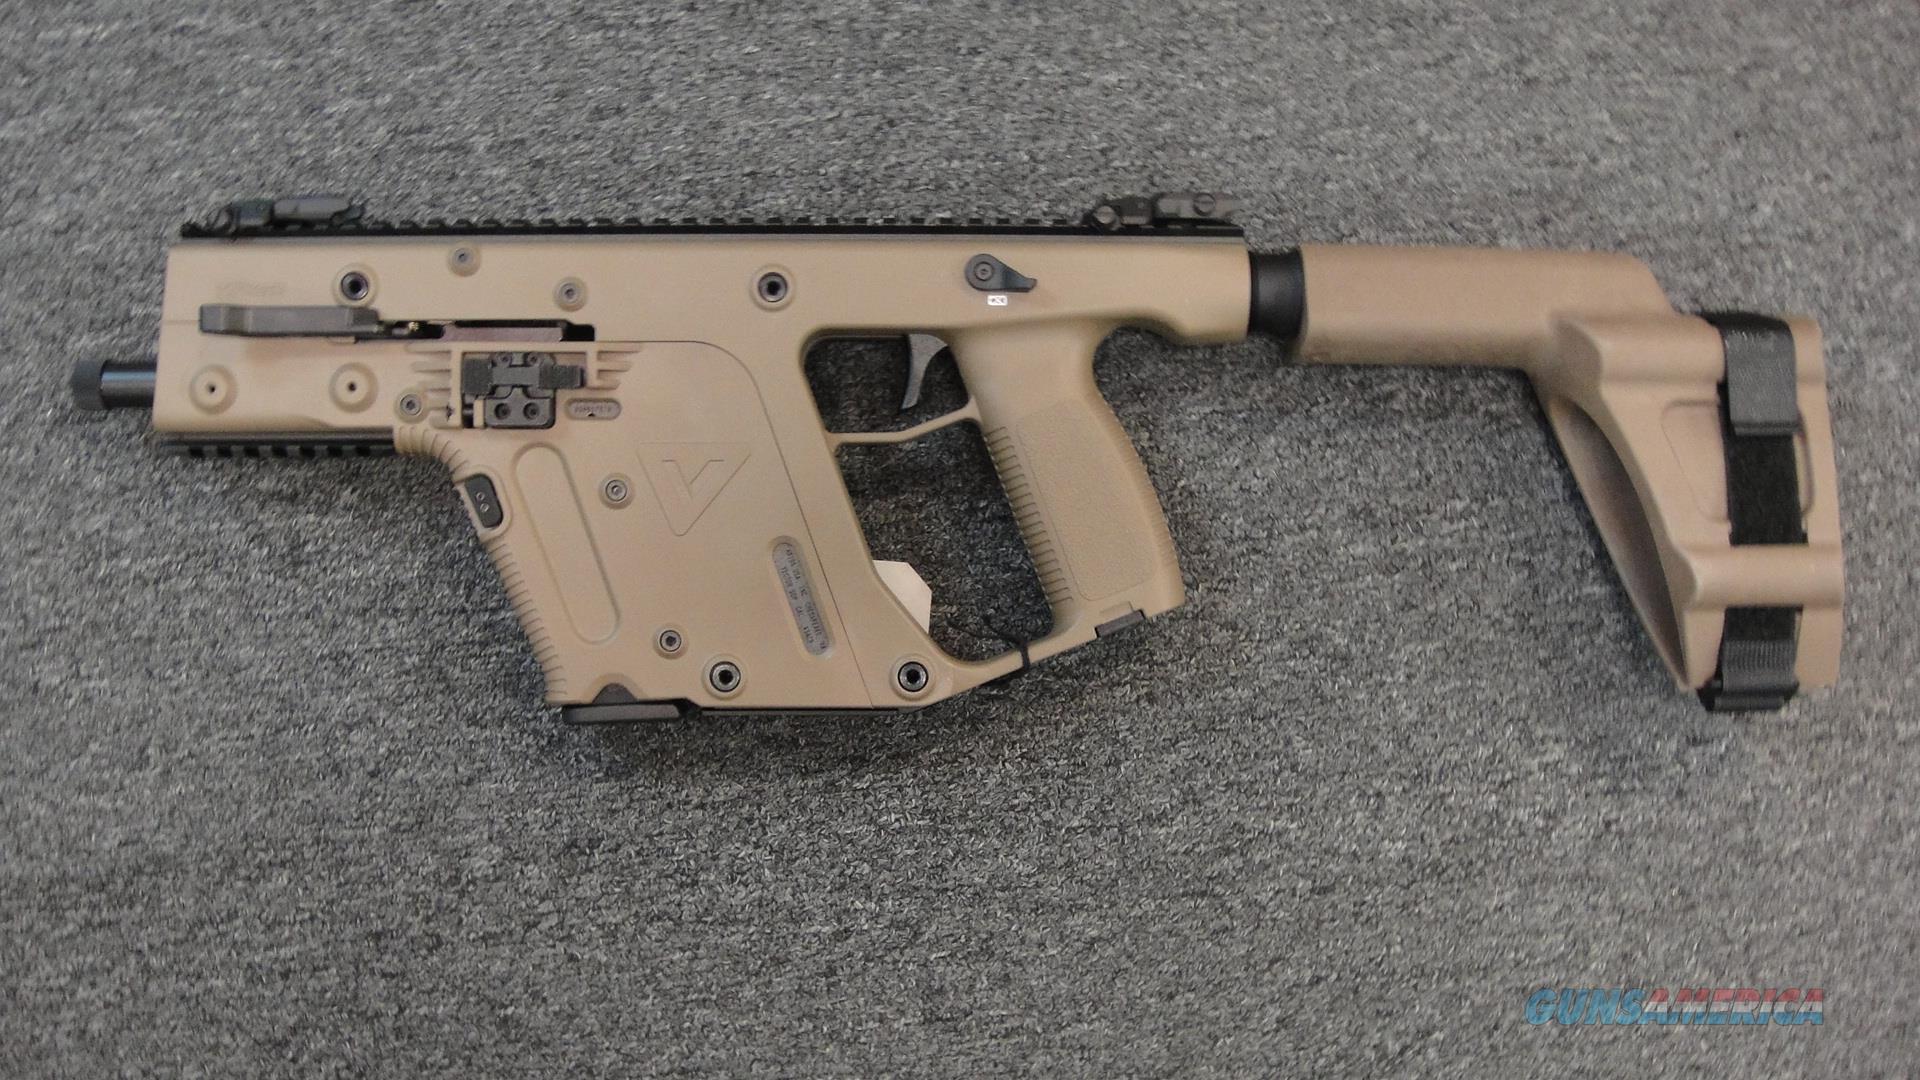 Kriss Vector SDP gen 2 .45ACP  Guns > Pistols > Kriss Tactical Pistols